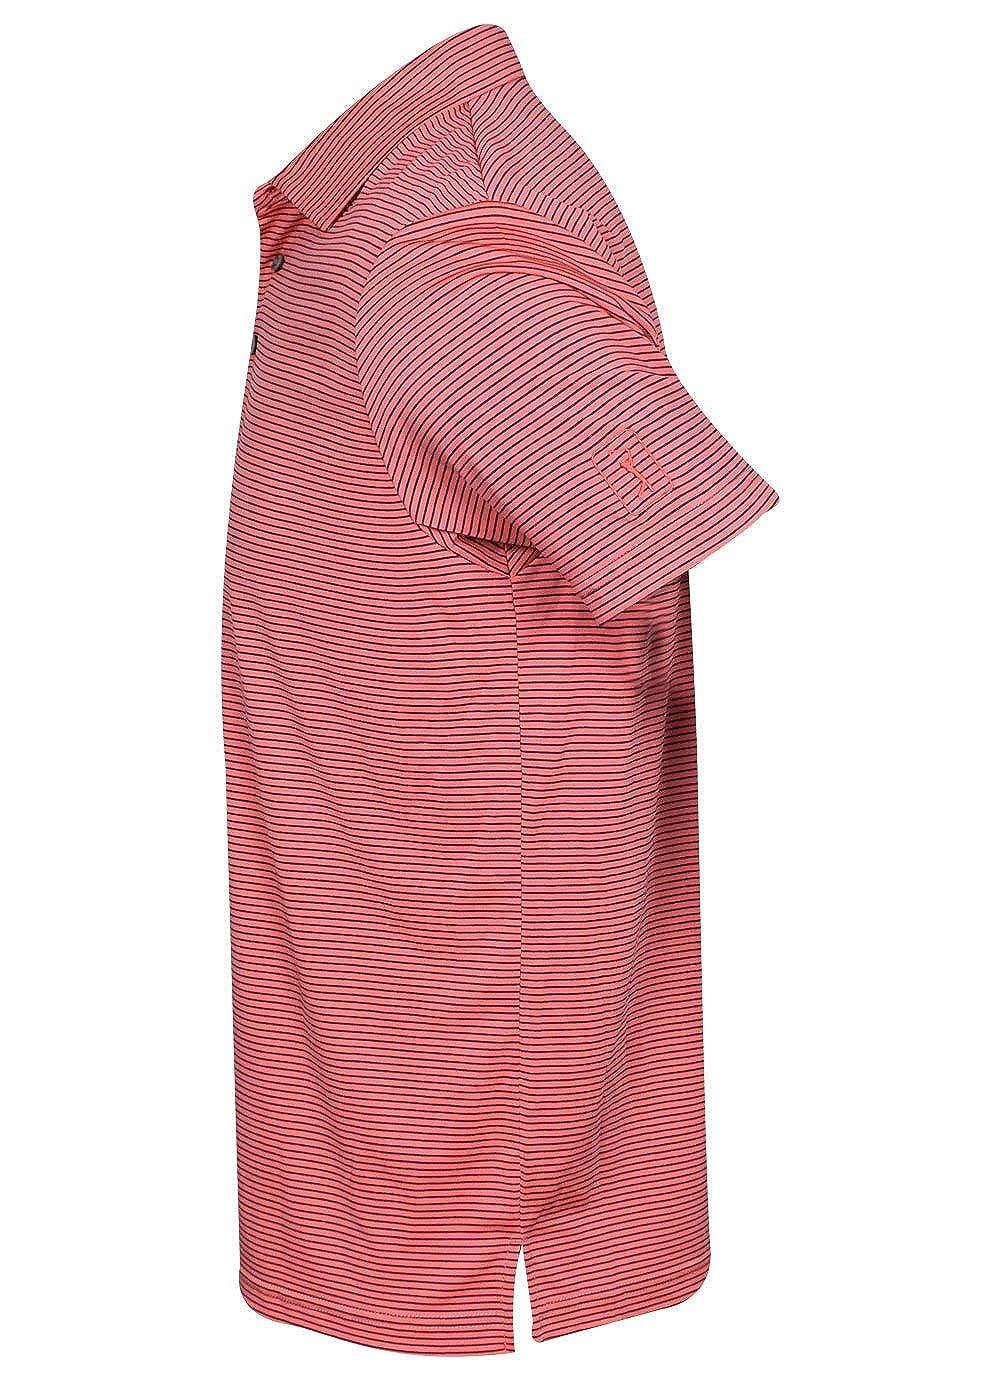 PGA TOUR Mens Short Sleeve Feeder Striped Polo